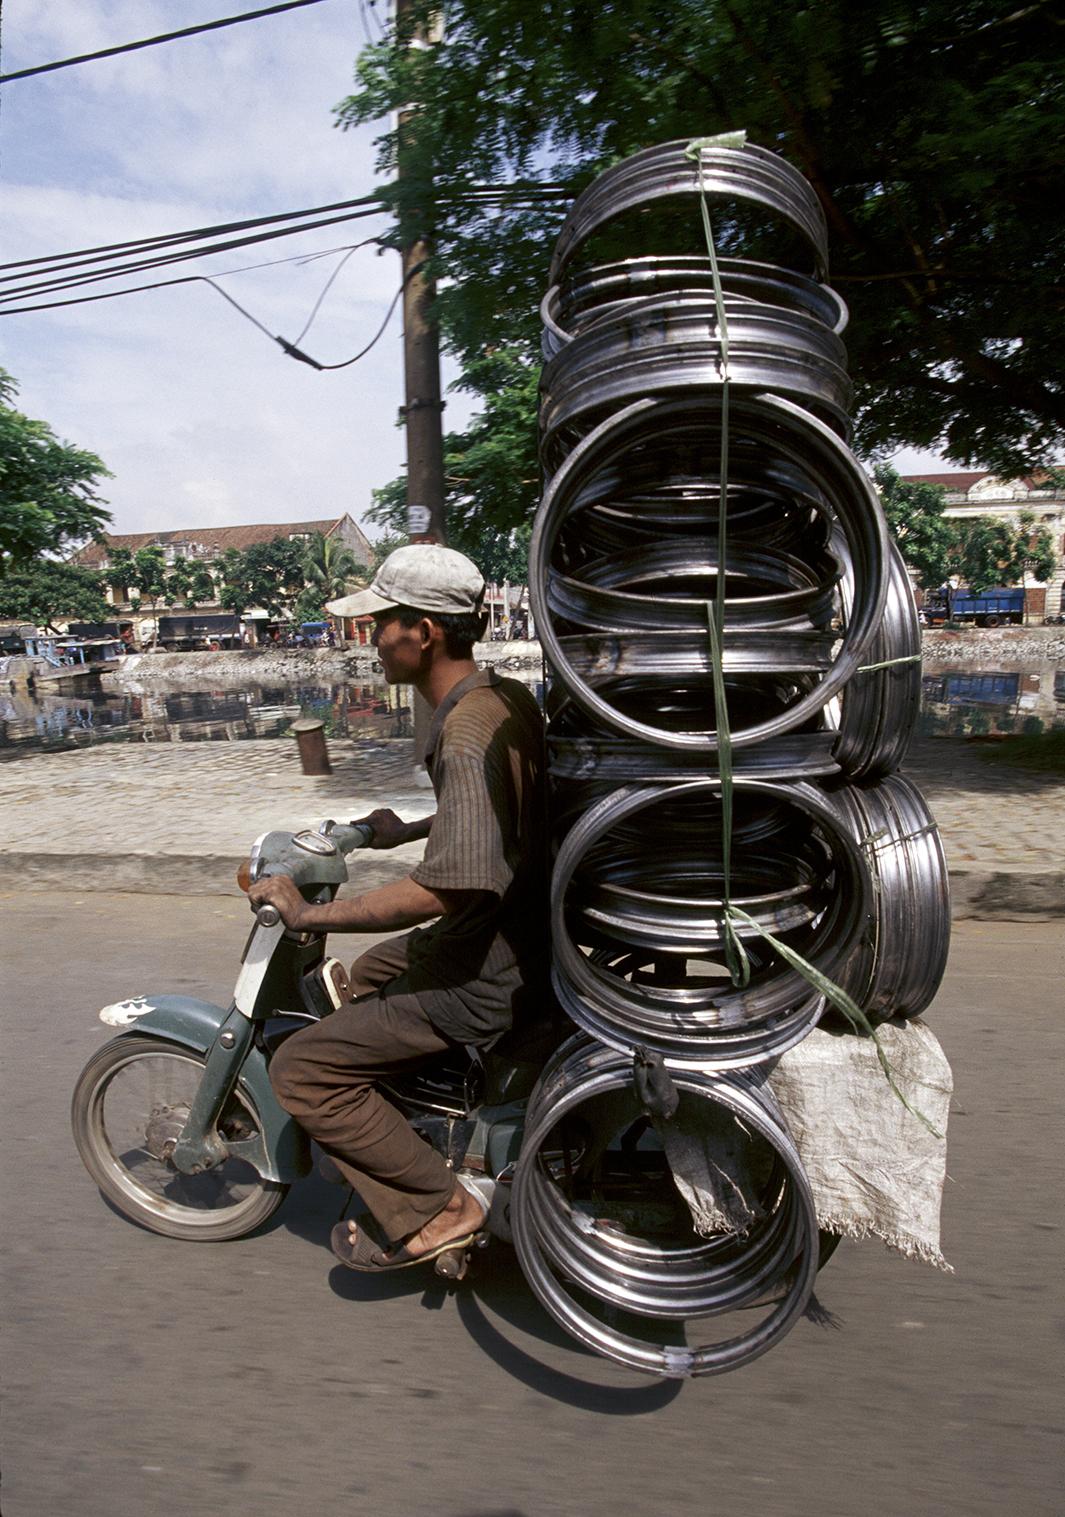 Bikes of Burden - Wheel Rims